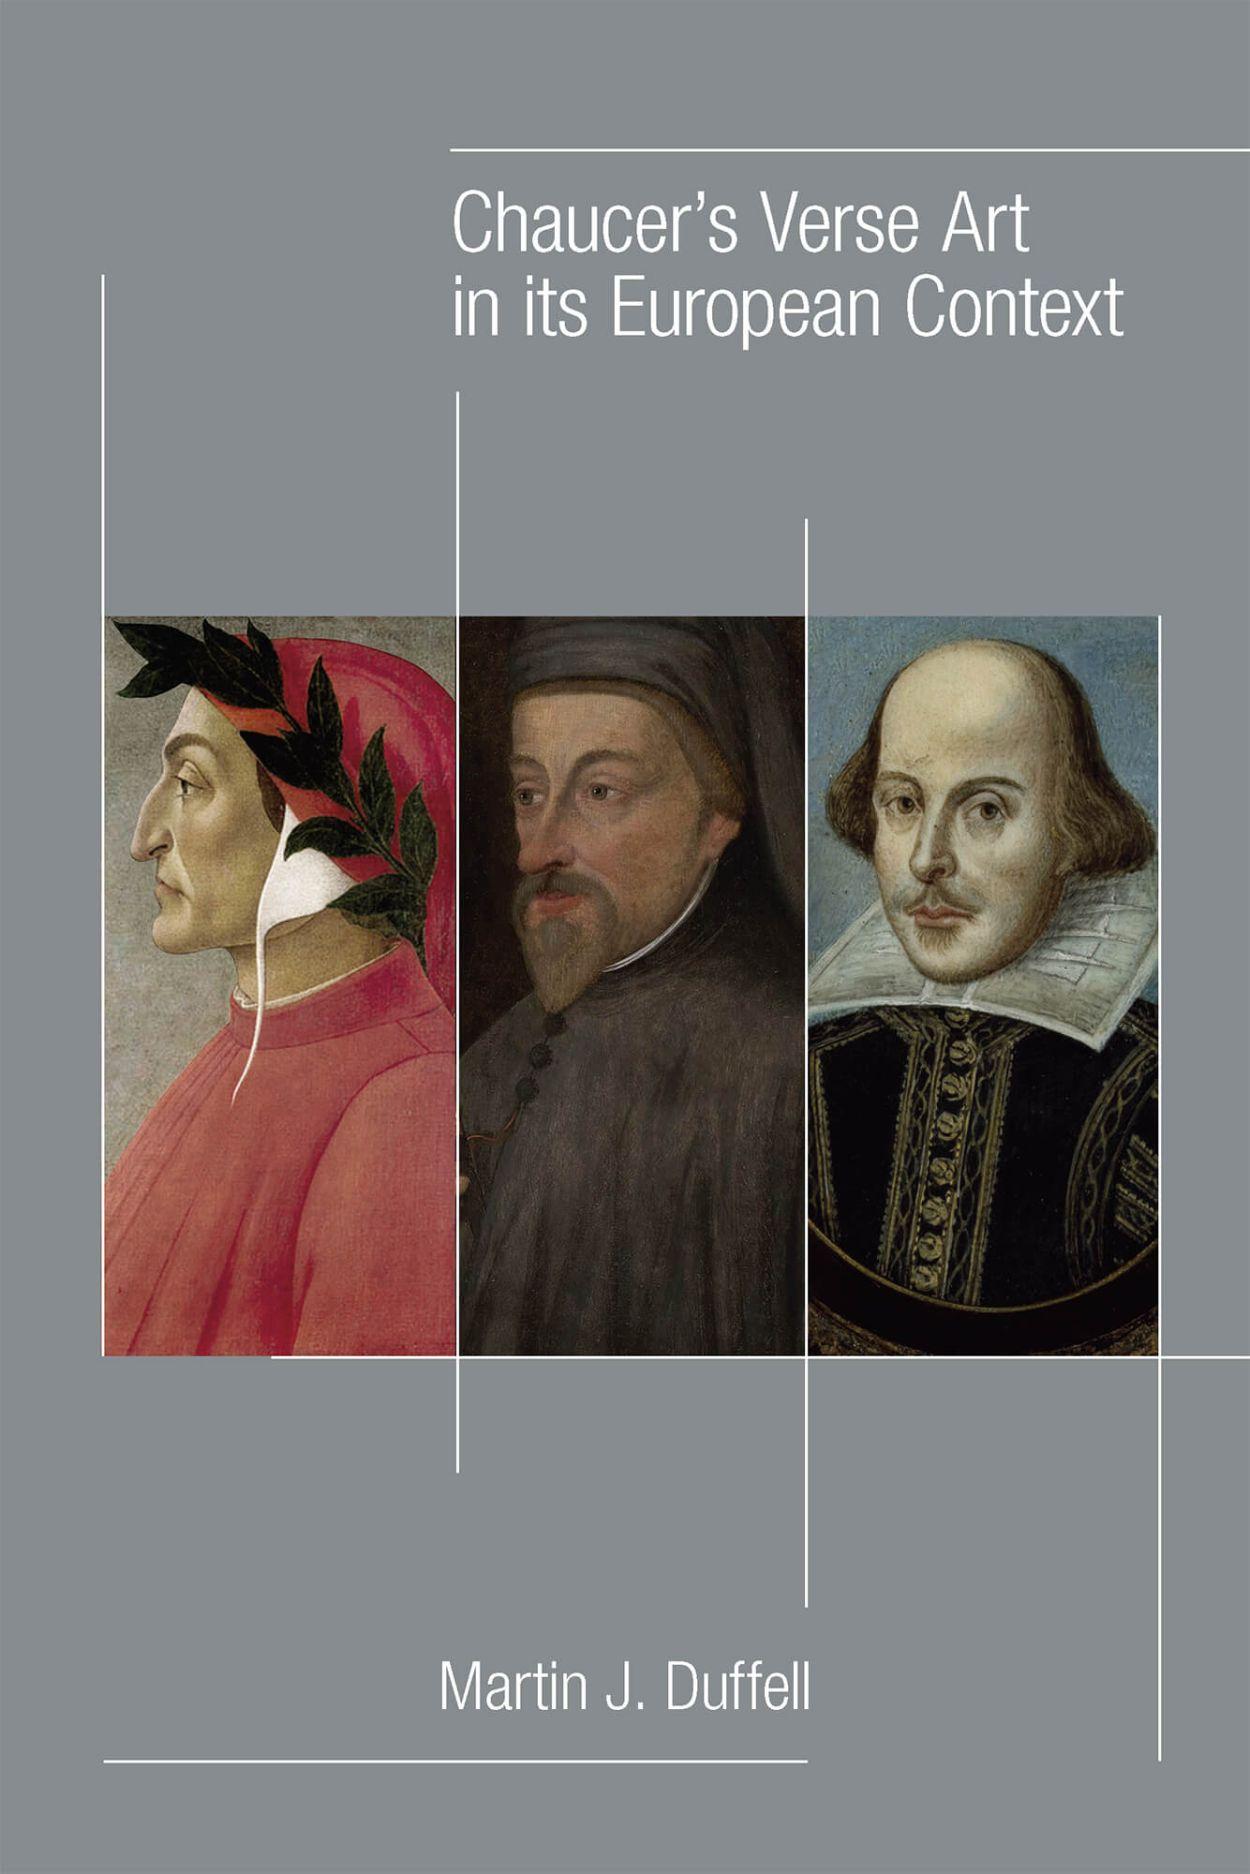 Chaucer's Verse Art in its European Context